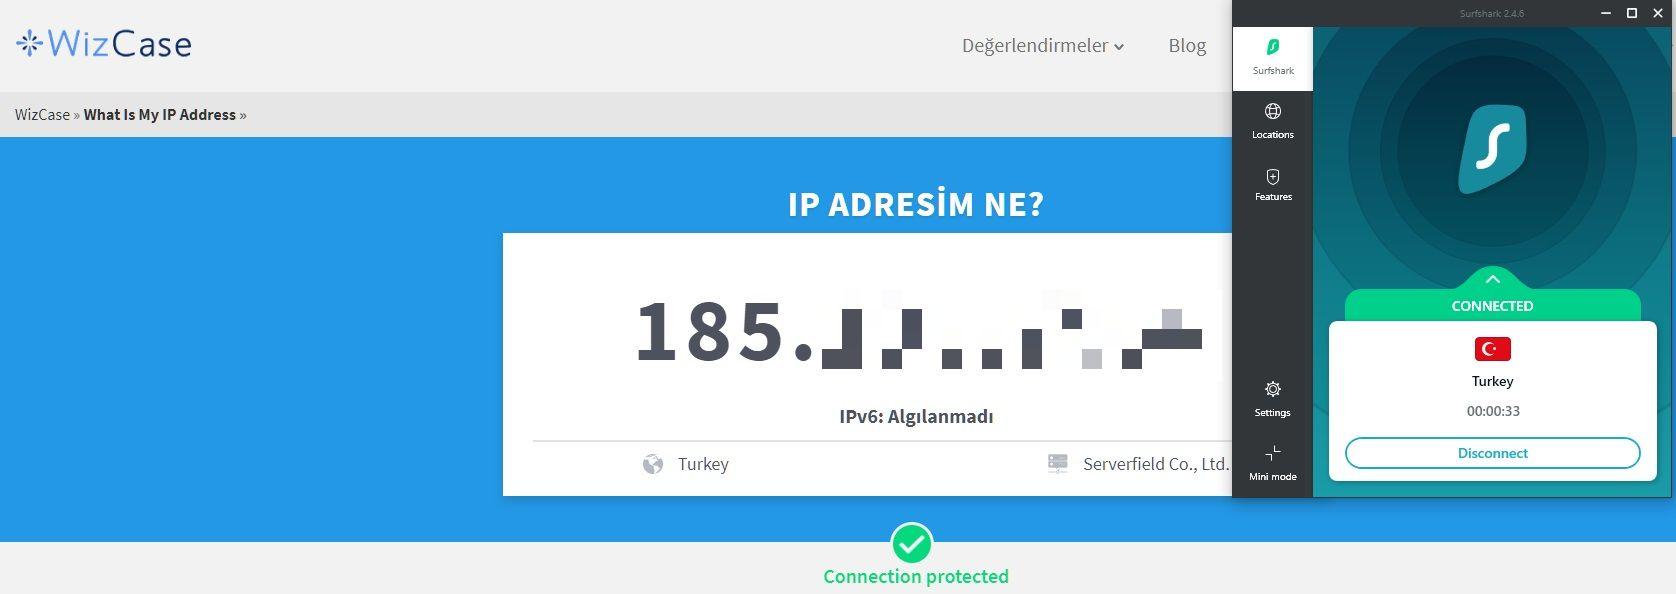 Wizcase IP adres aracım nedir